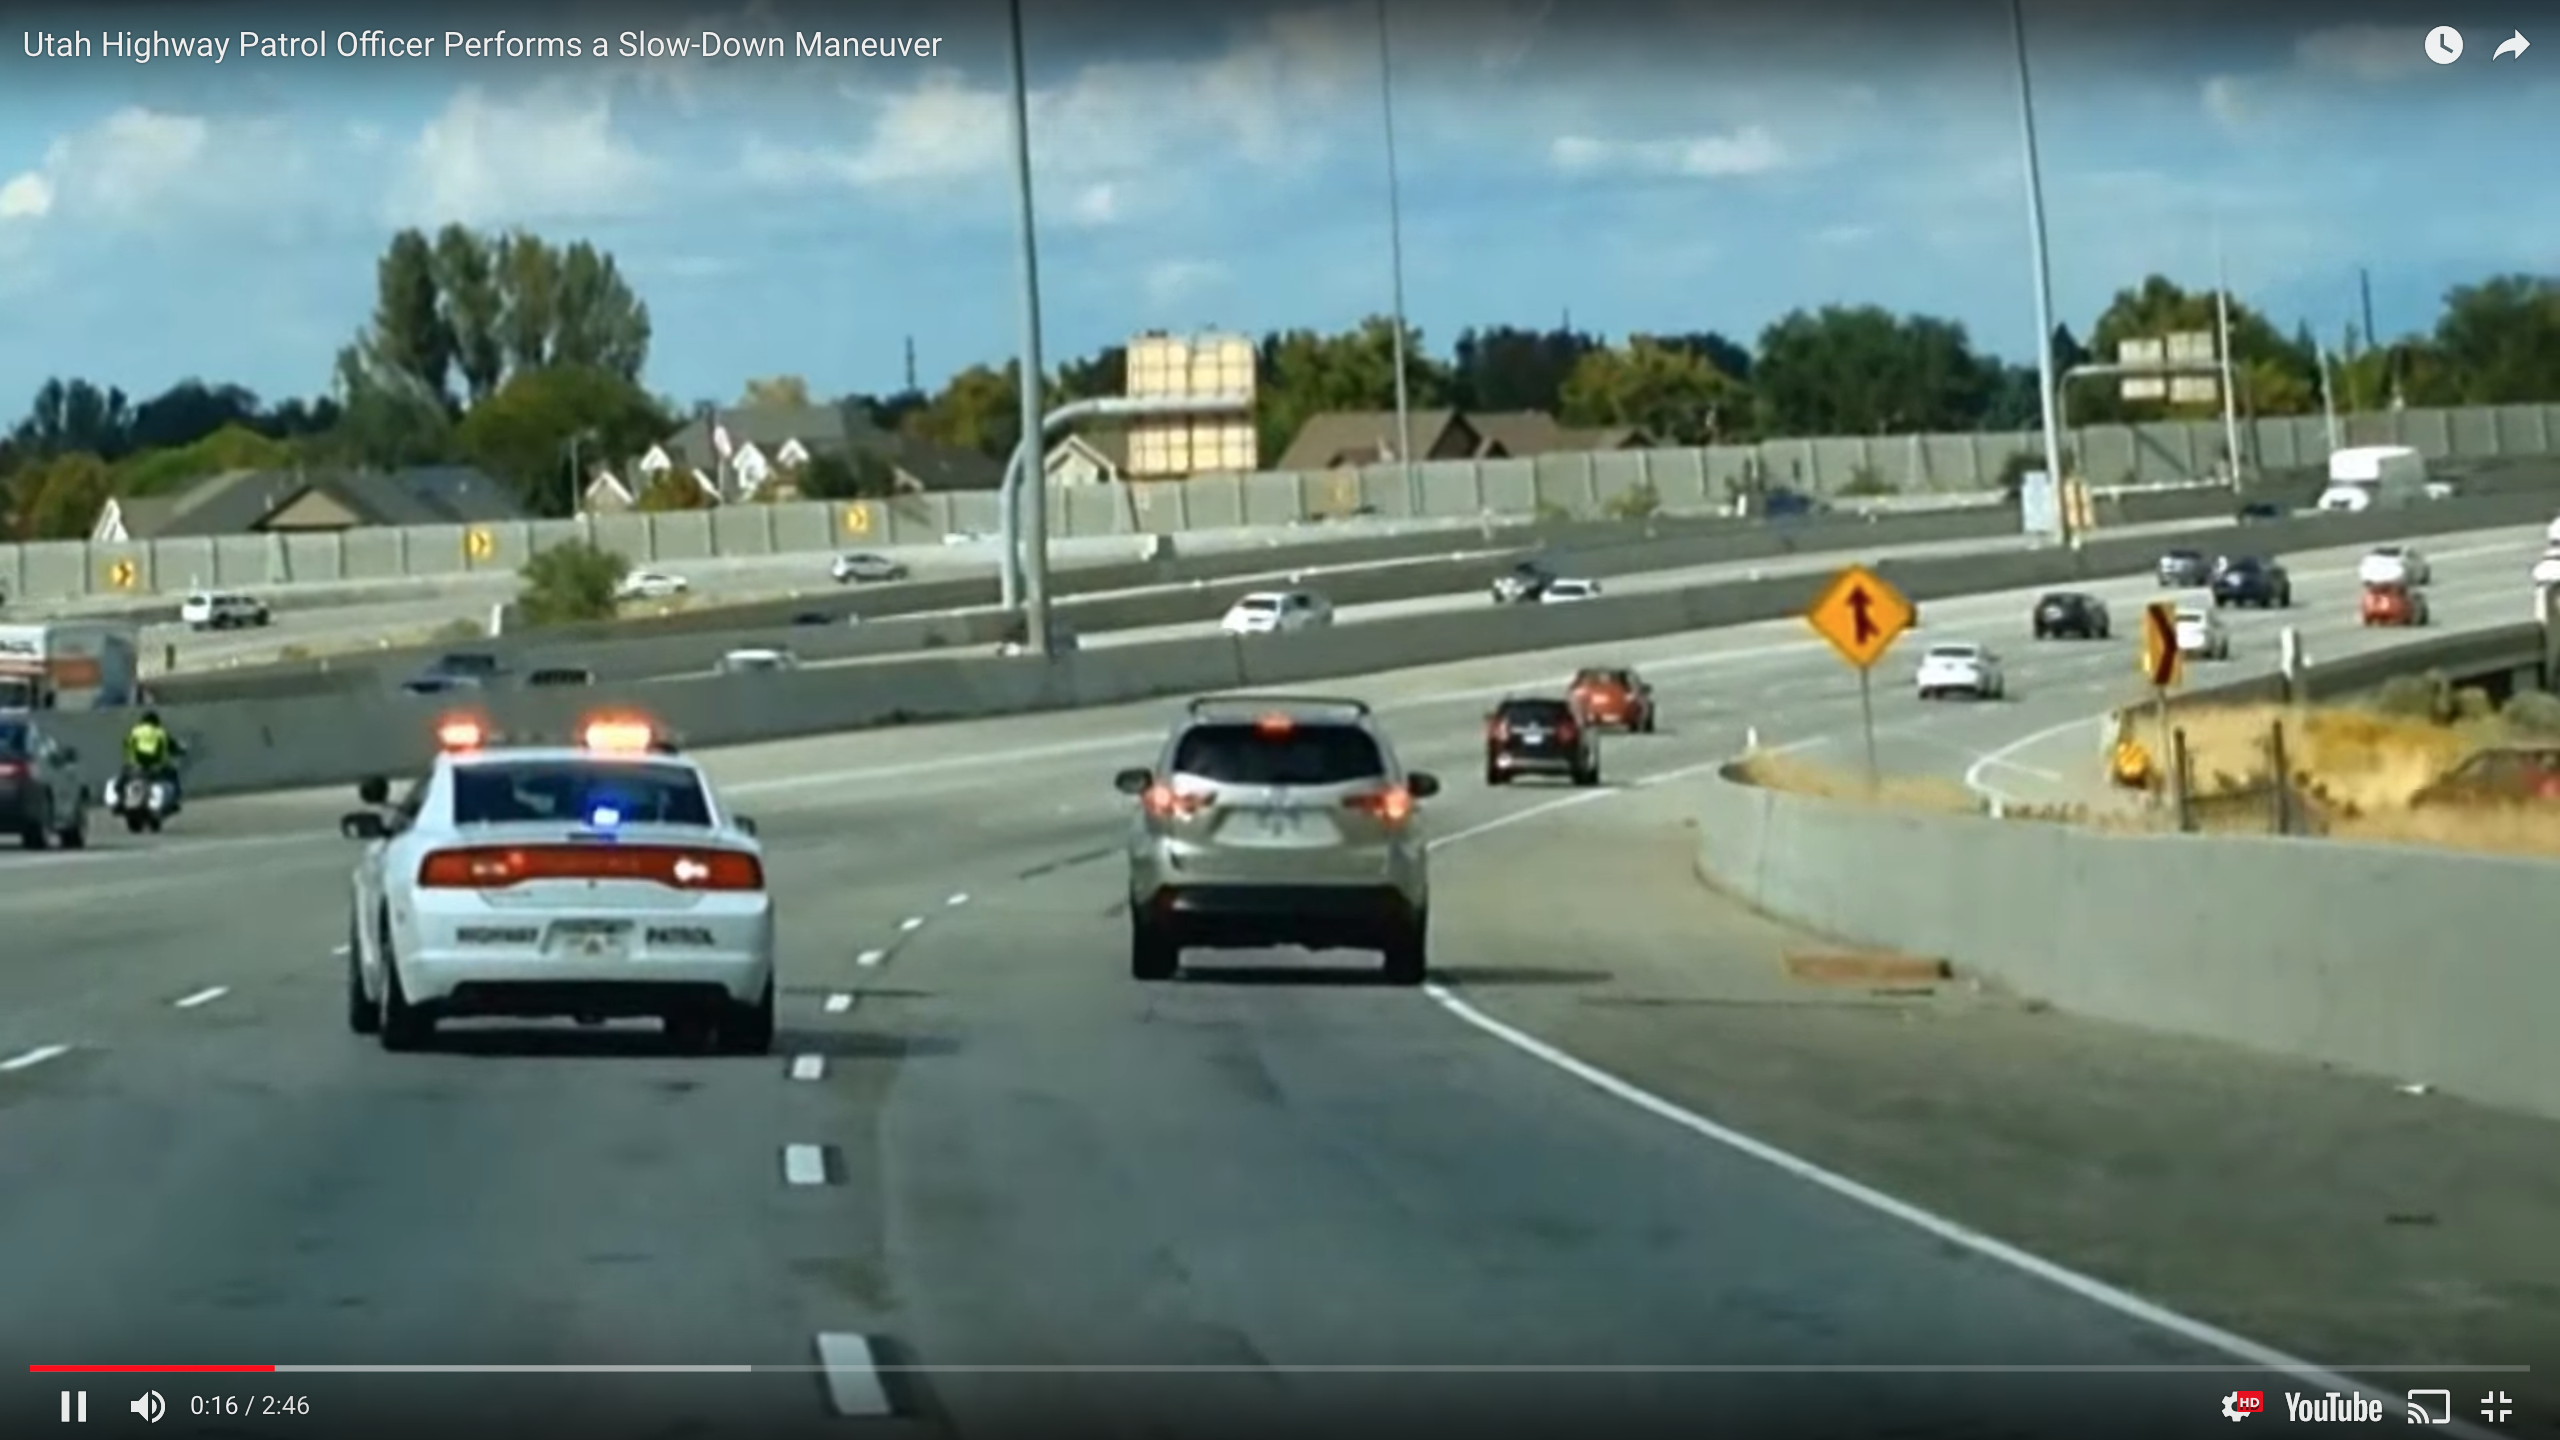 A Traffic Break in Utah